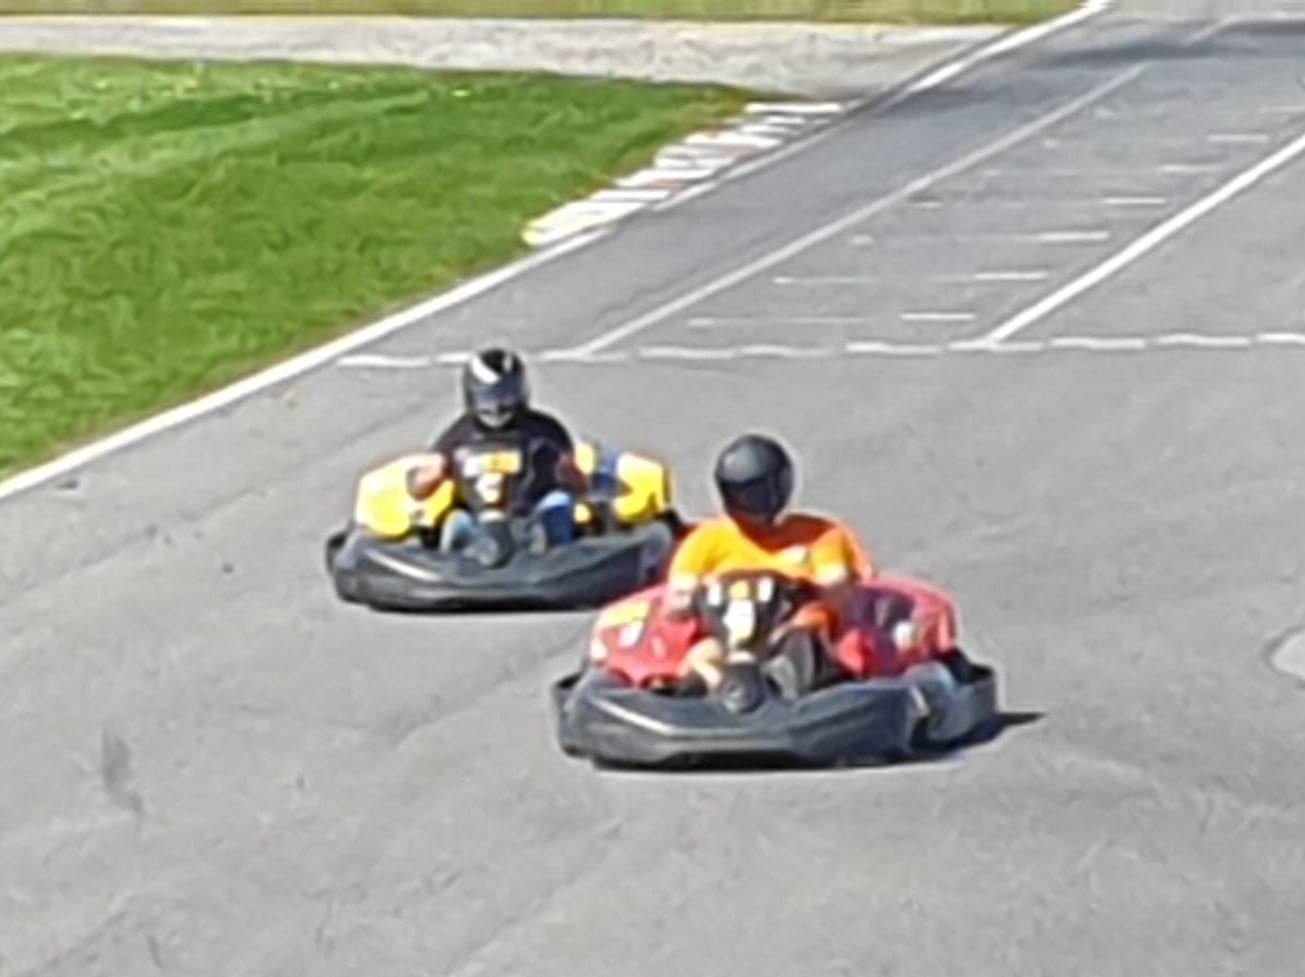 Blaulicht Grand Prix